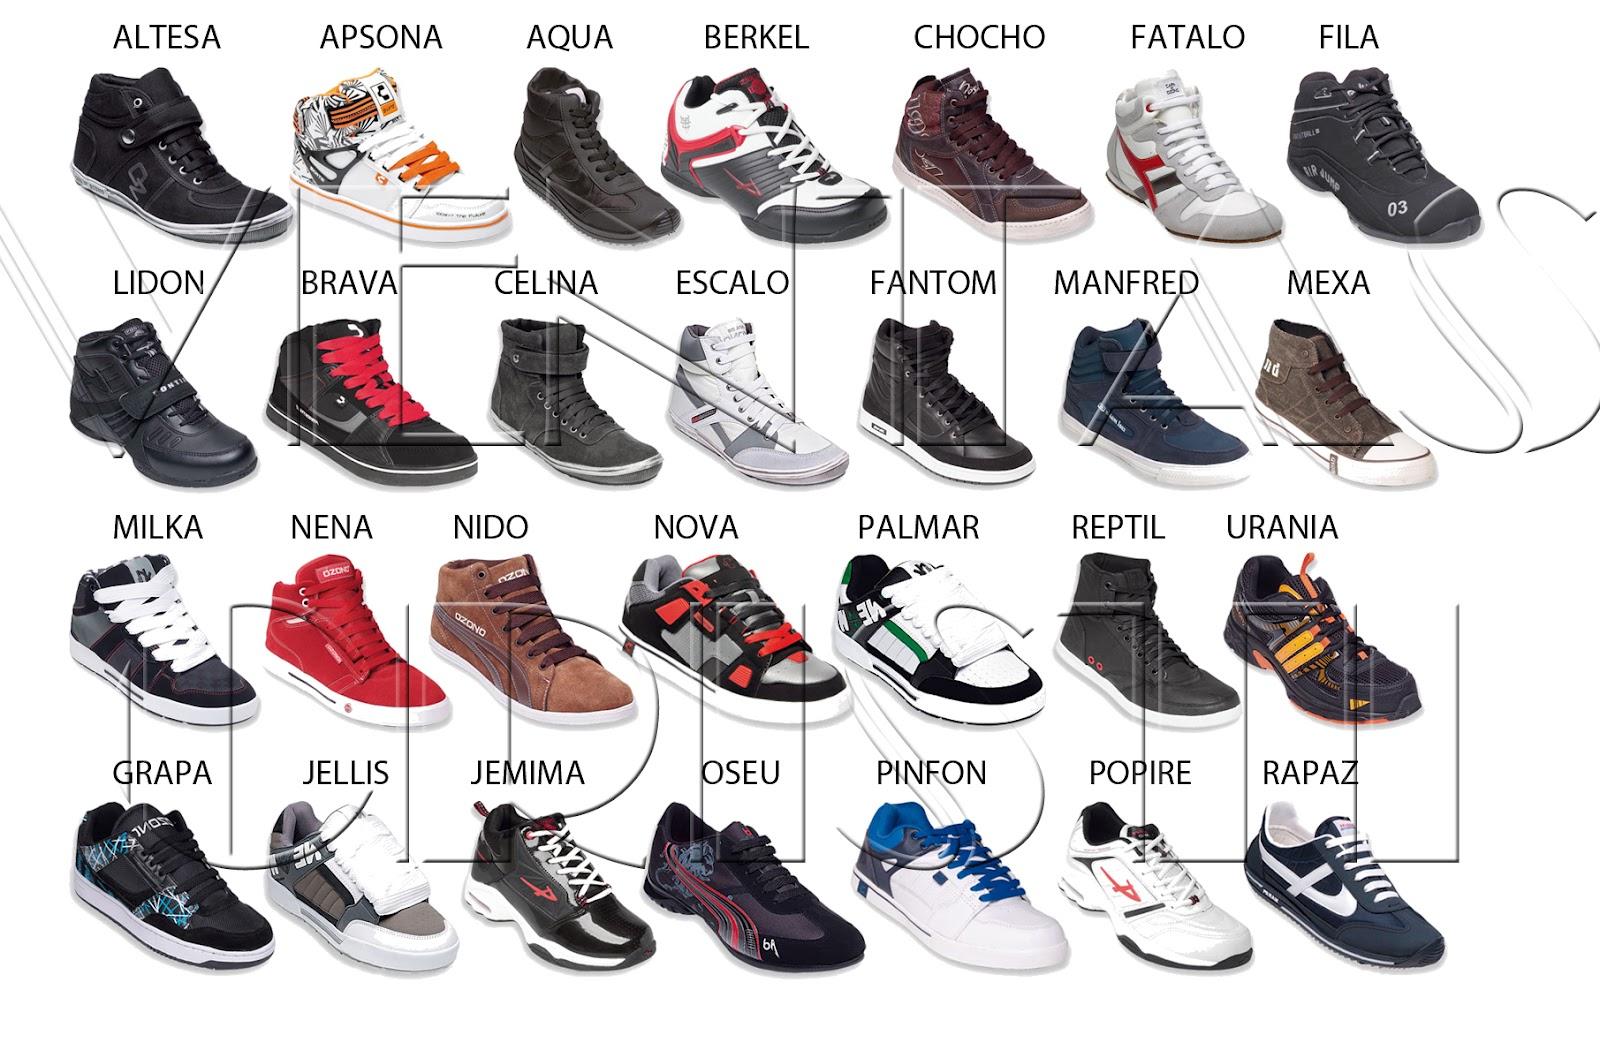 Venta de calzado de marca a mayoreo calzado deportivo for Calzado de seguridad deportivo